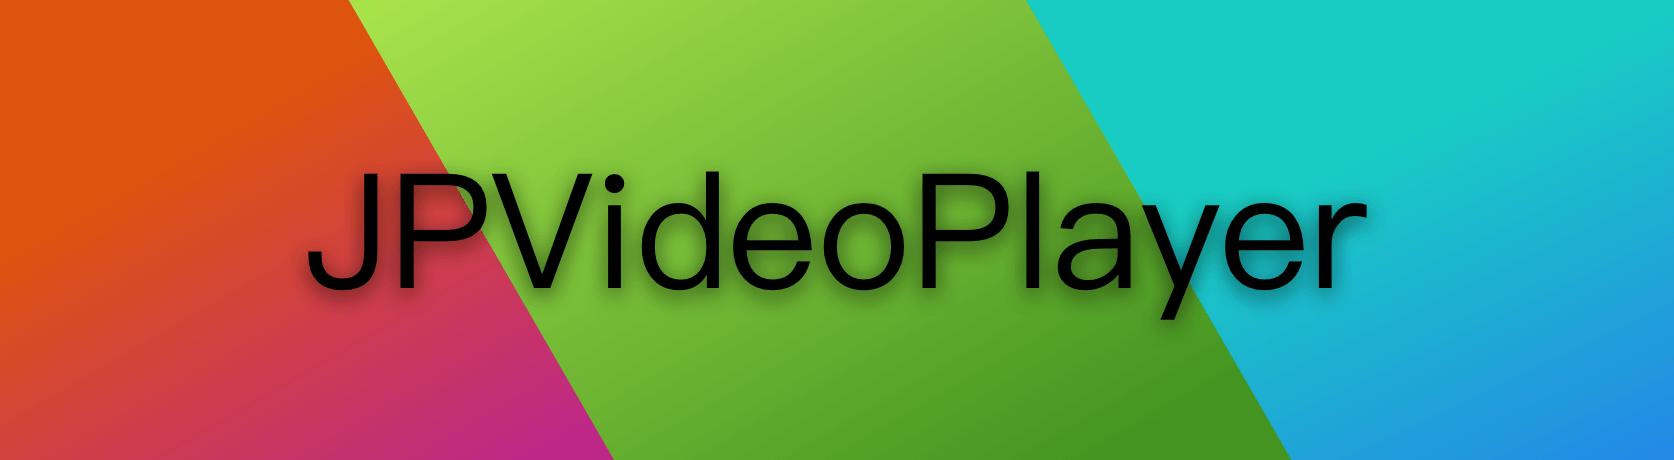 JPVideoPlayer